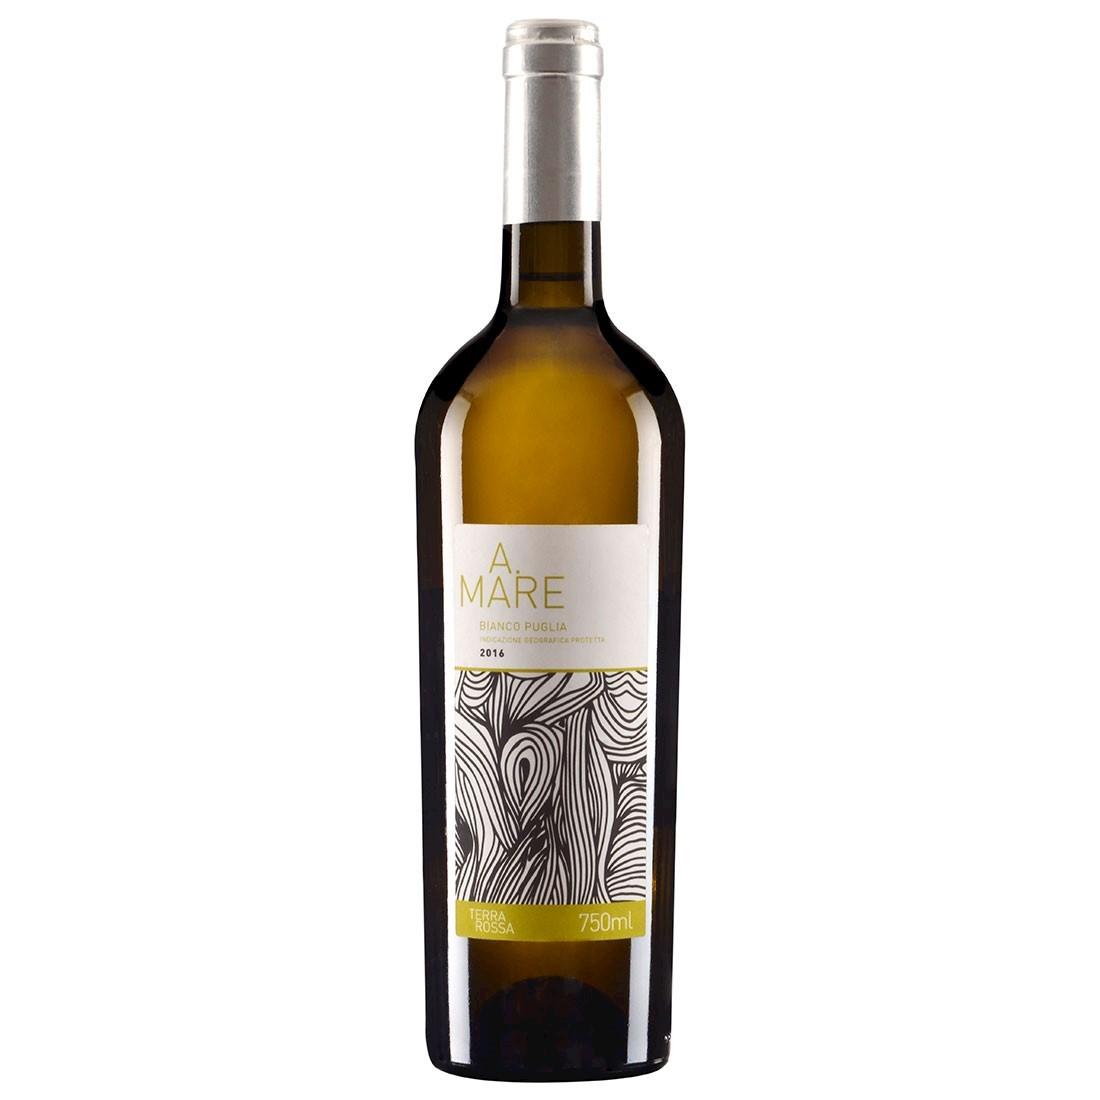 Vinho Italiano Dai Terra Rossa A.Mare Bianco Puglia IGP 2018 (750ml)